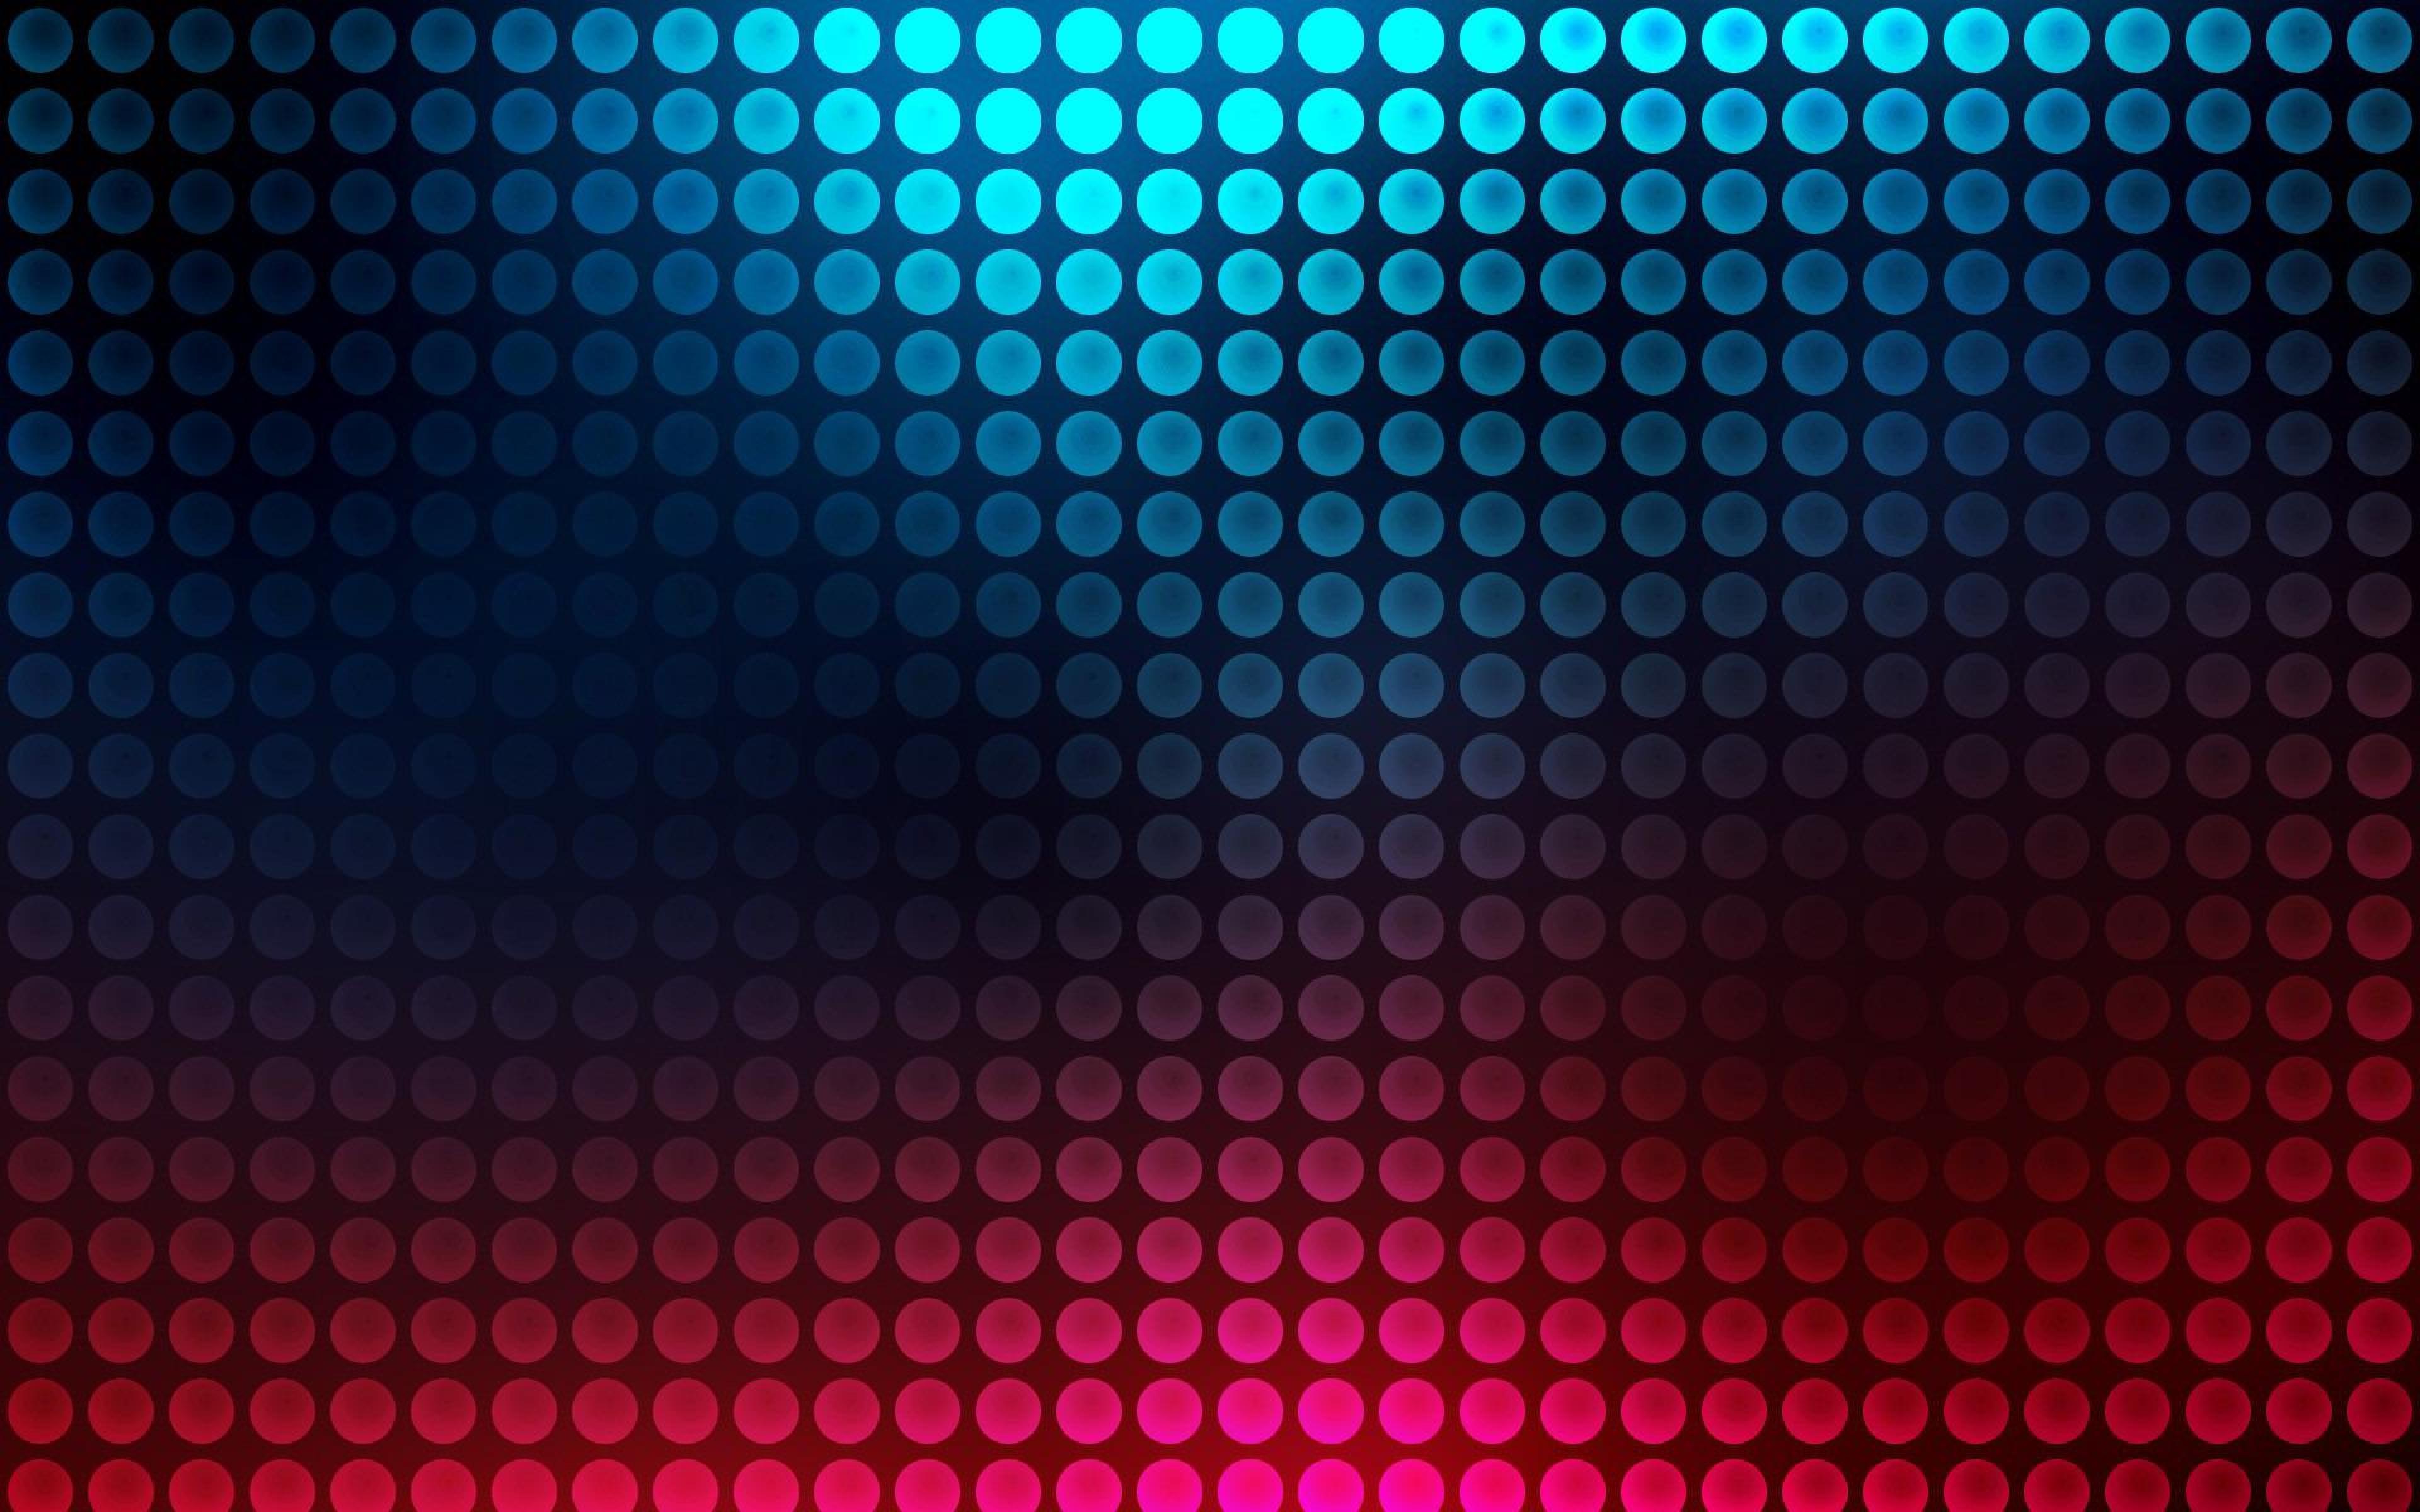 3d Moving Wallpaper For Mac Free Download Dot Backgrounds Pixelstalk Net